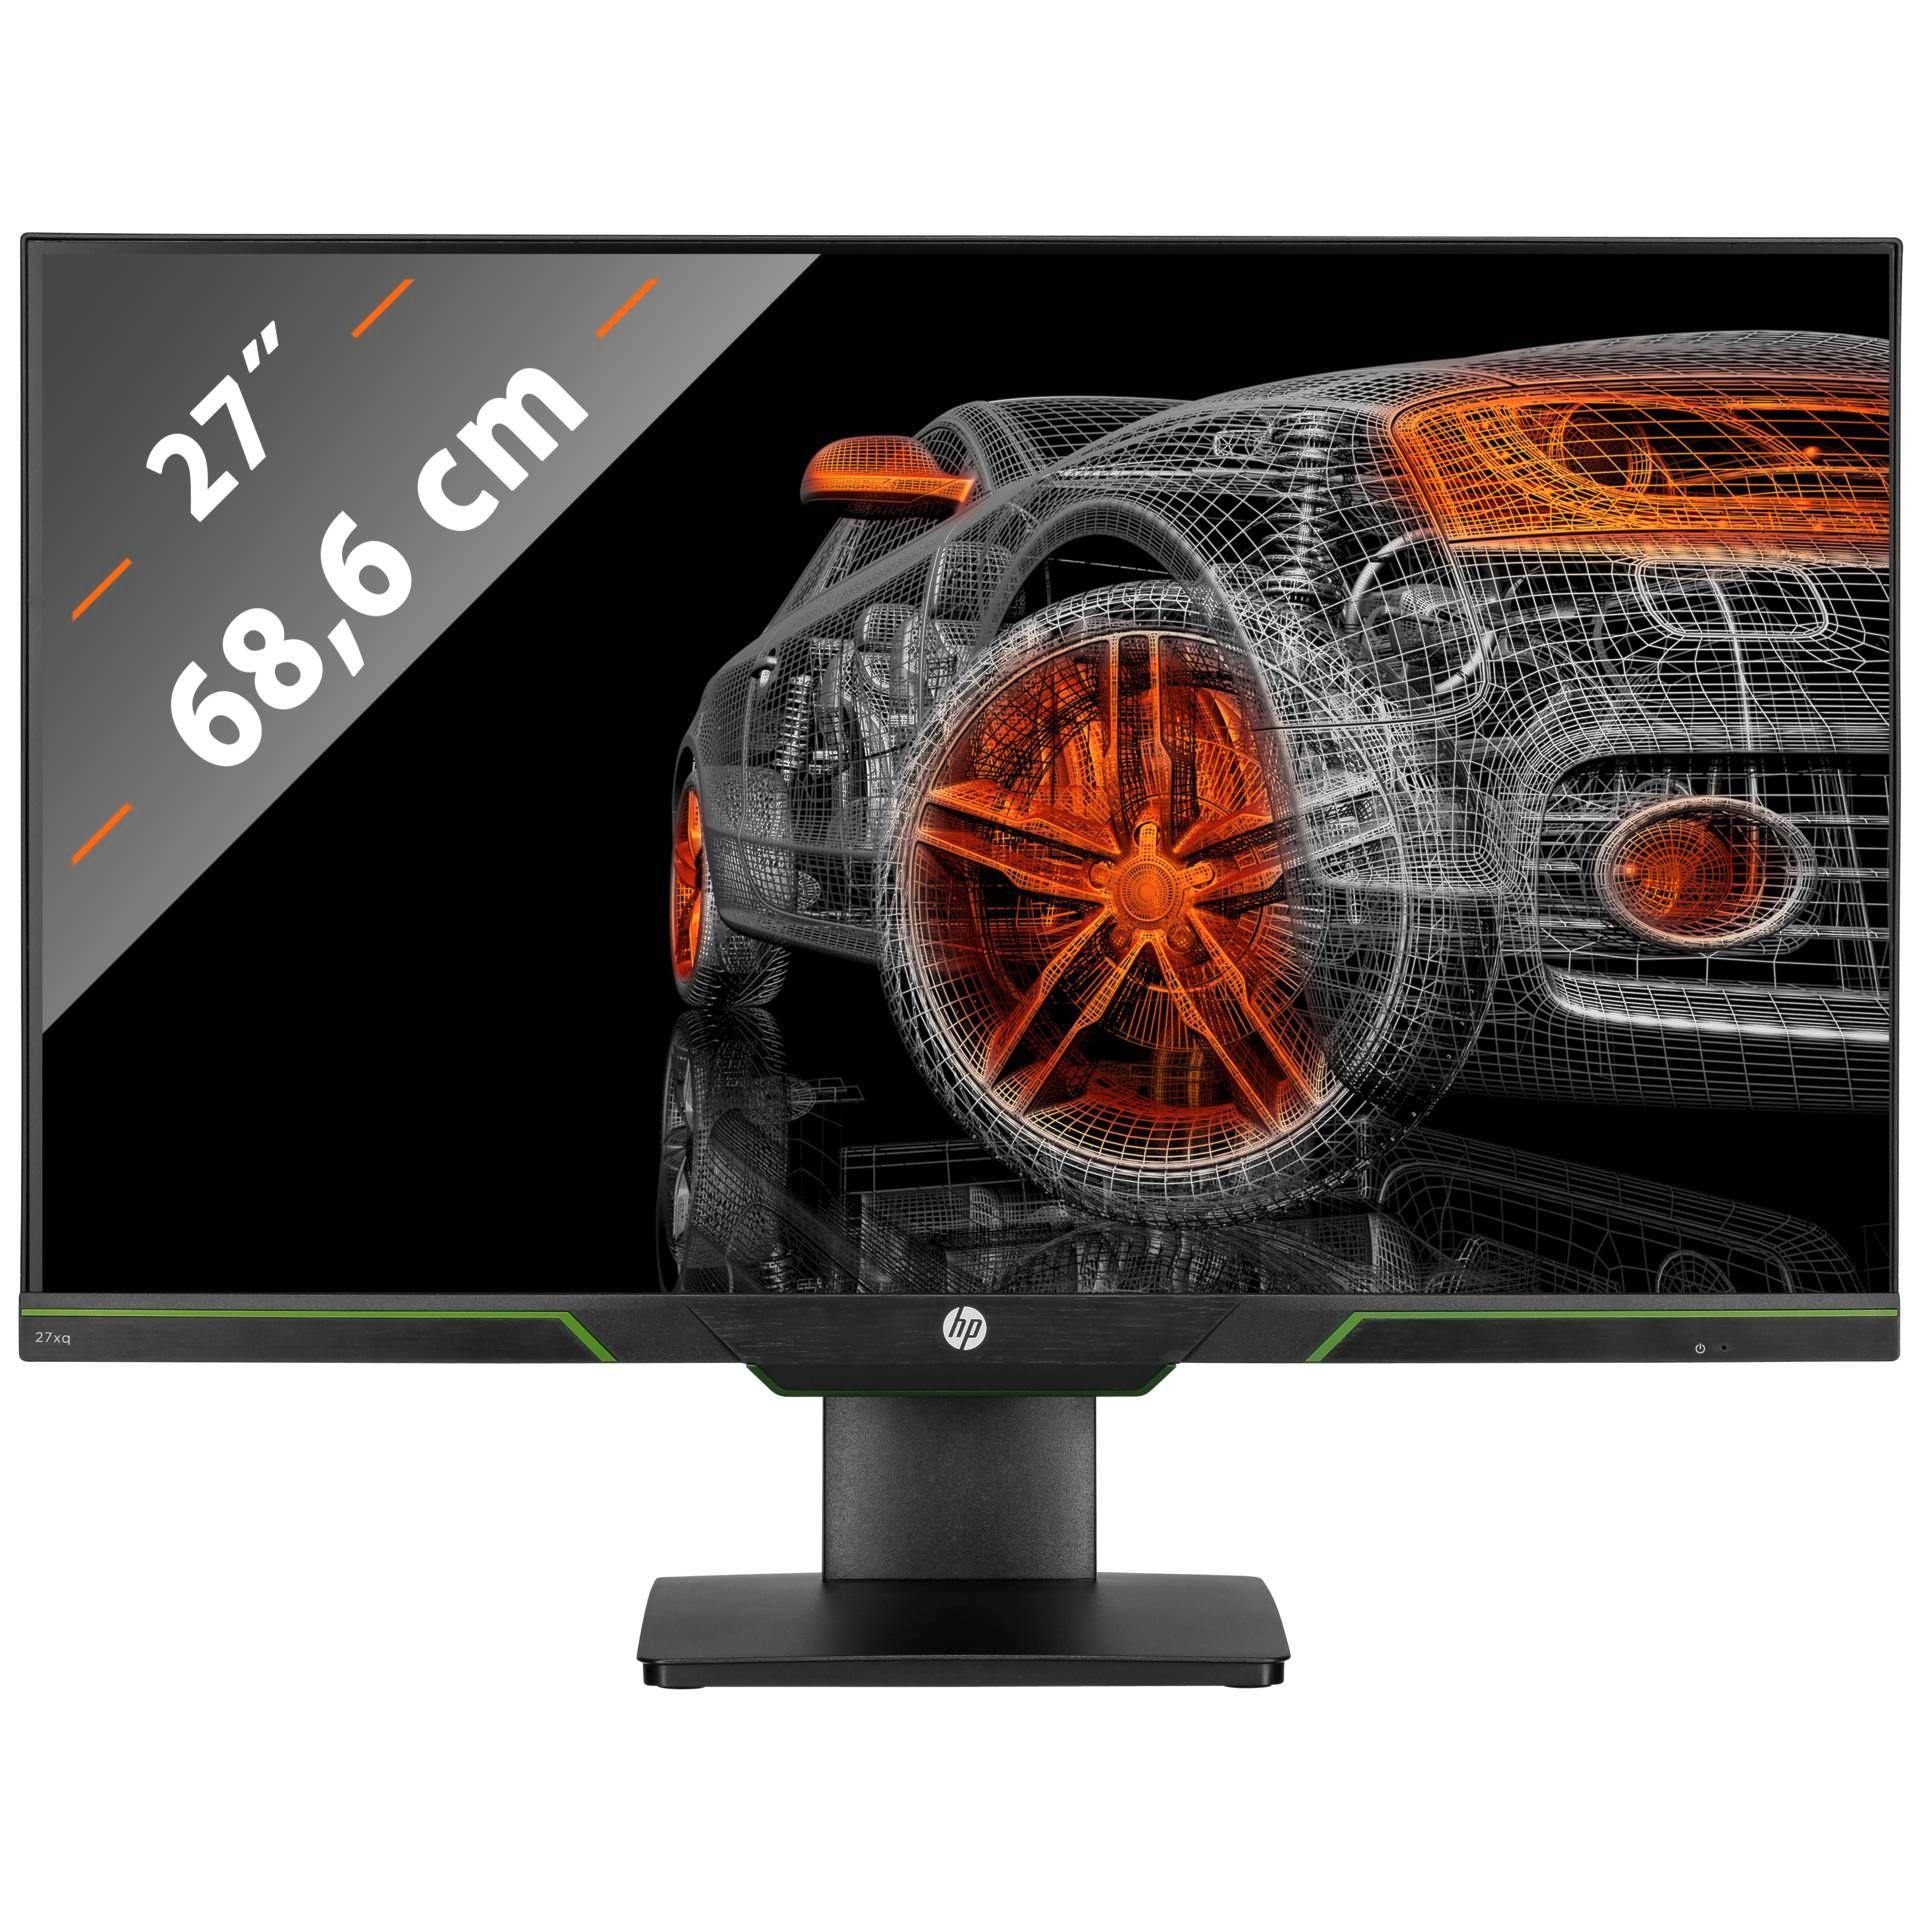 B-Ware HP 27xq Monitor 27 Zoll 144Hz 1ms WQHD